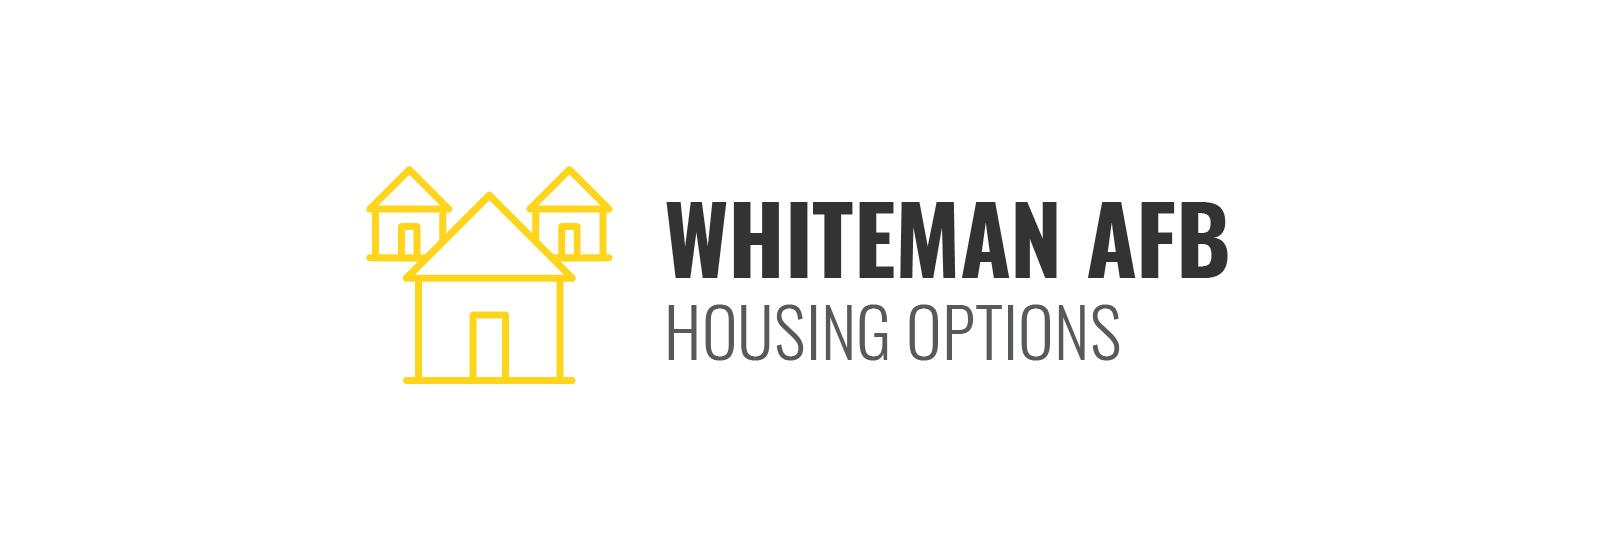 Whiteman AFB Housing Options